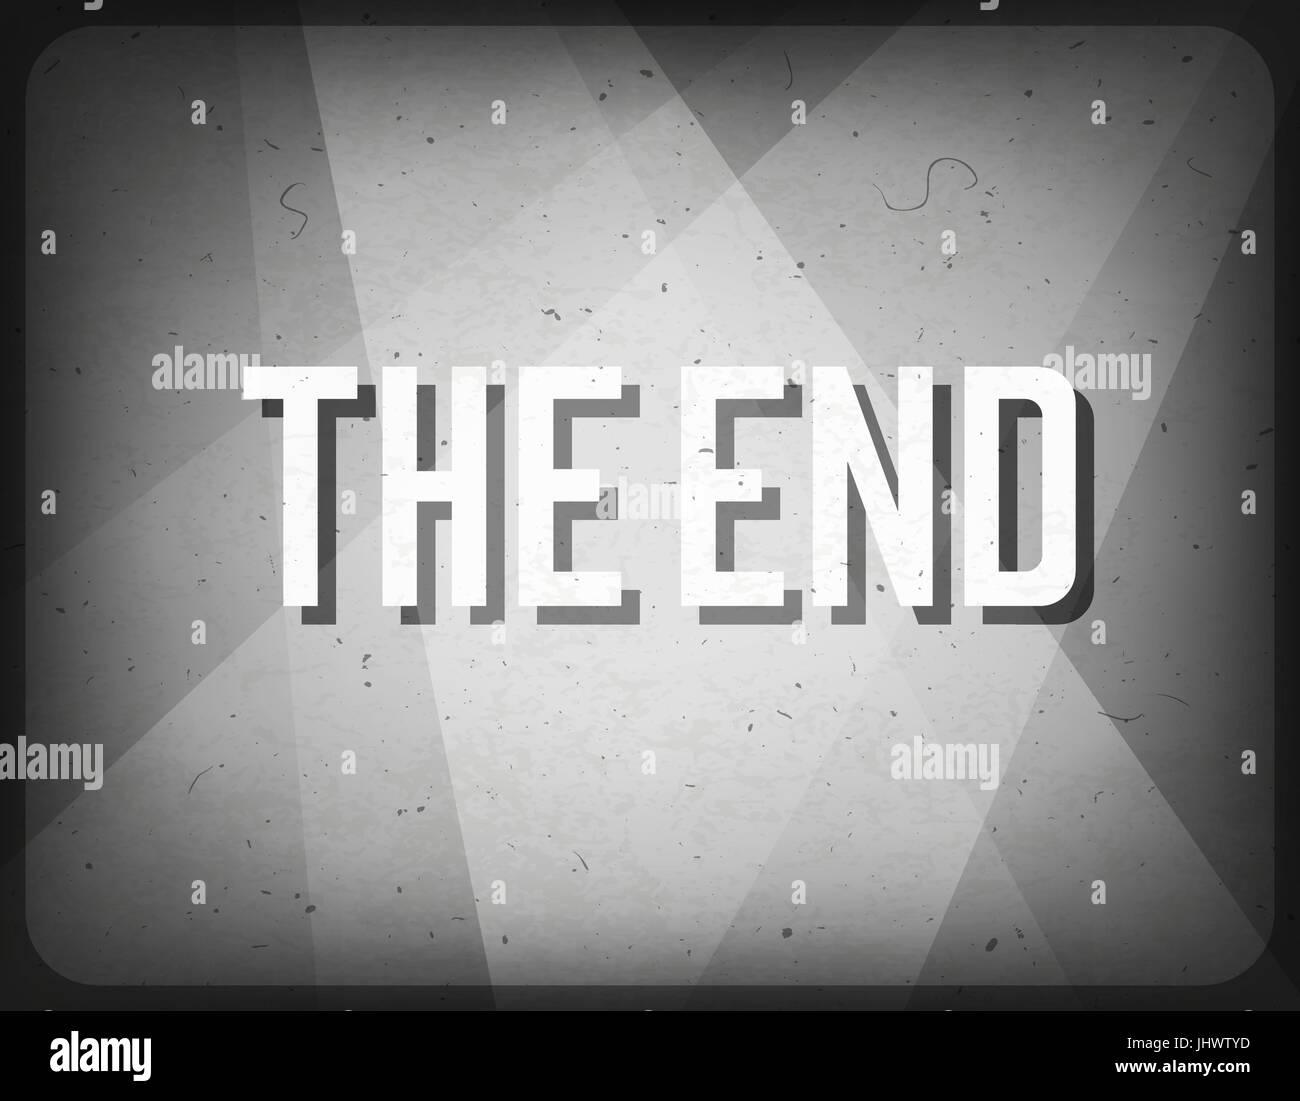 Movie ending screen. Cinema background. - Stock Vector